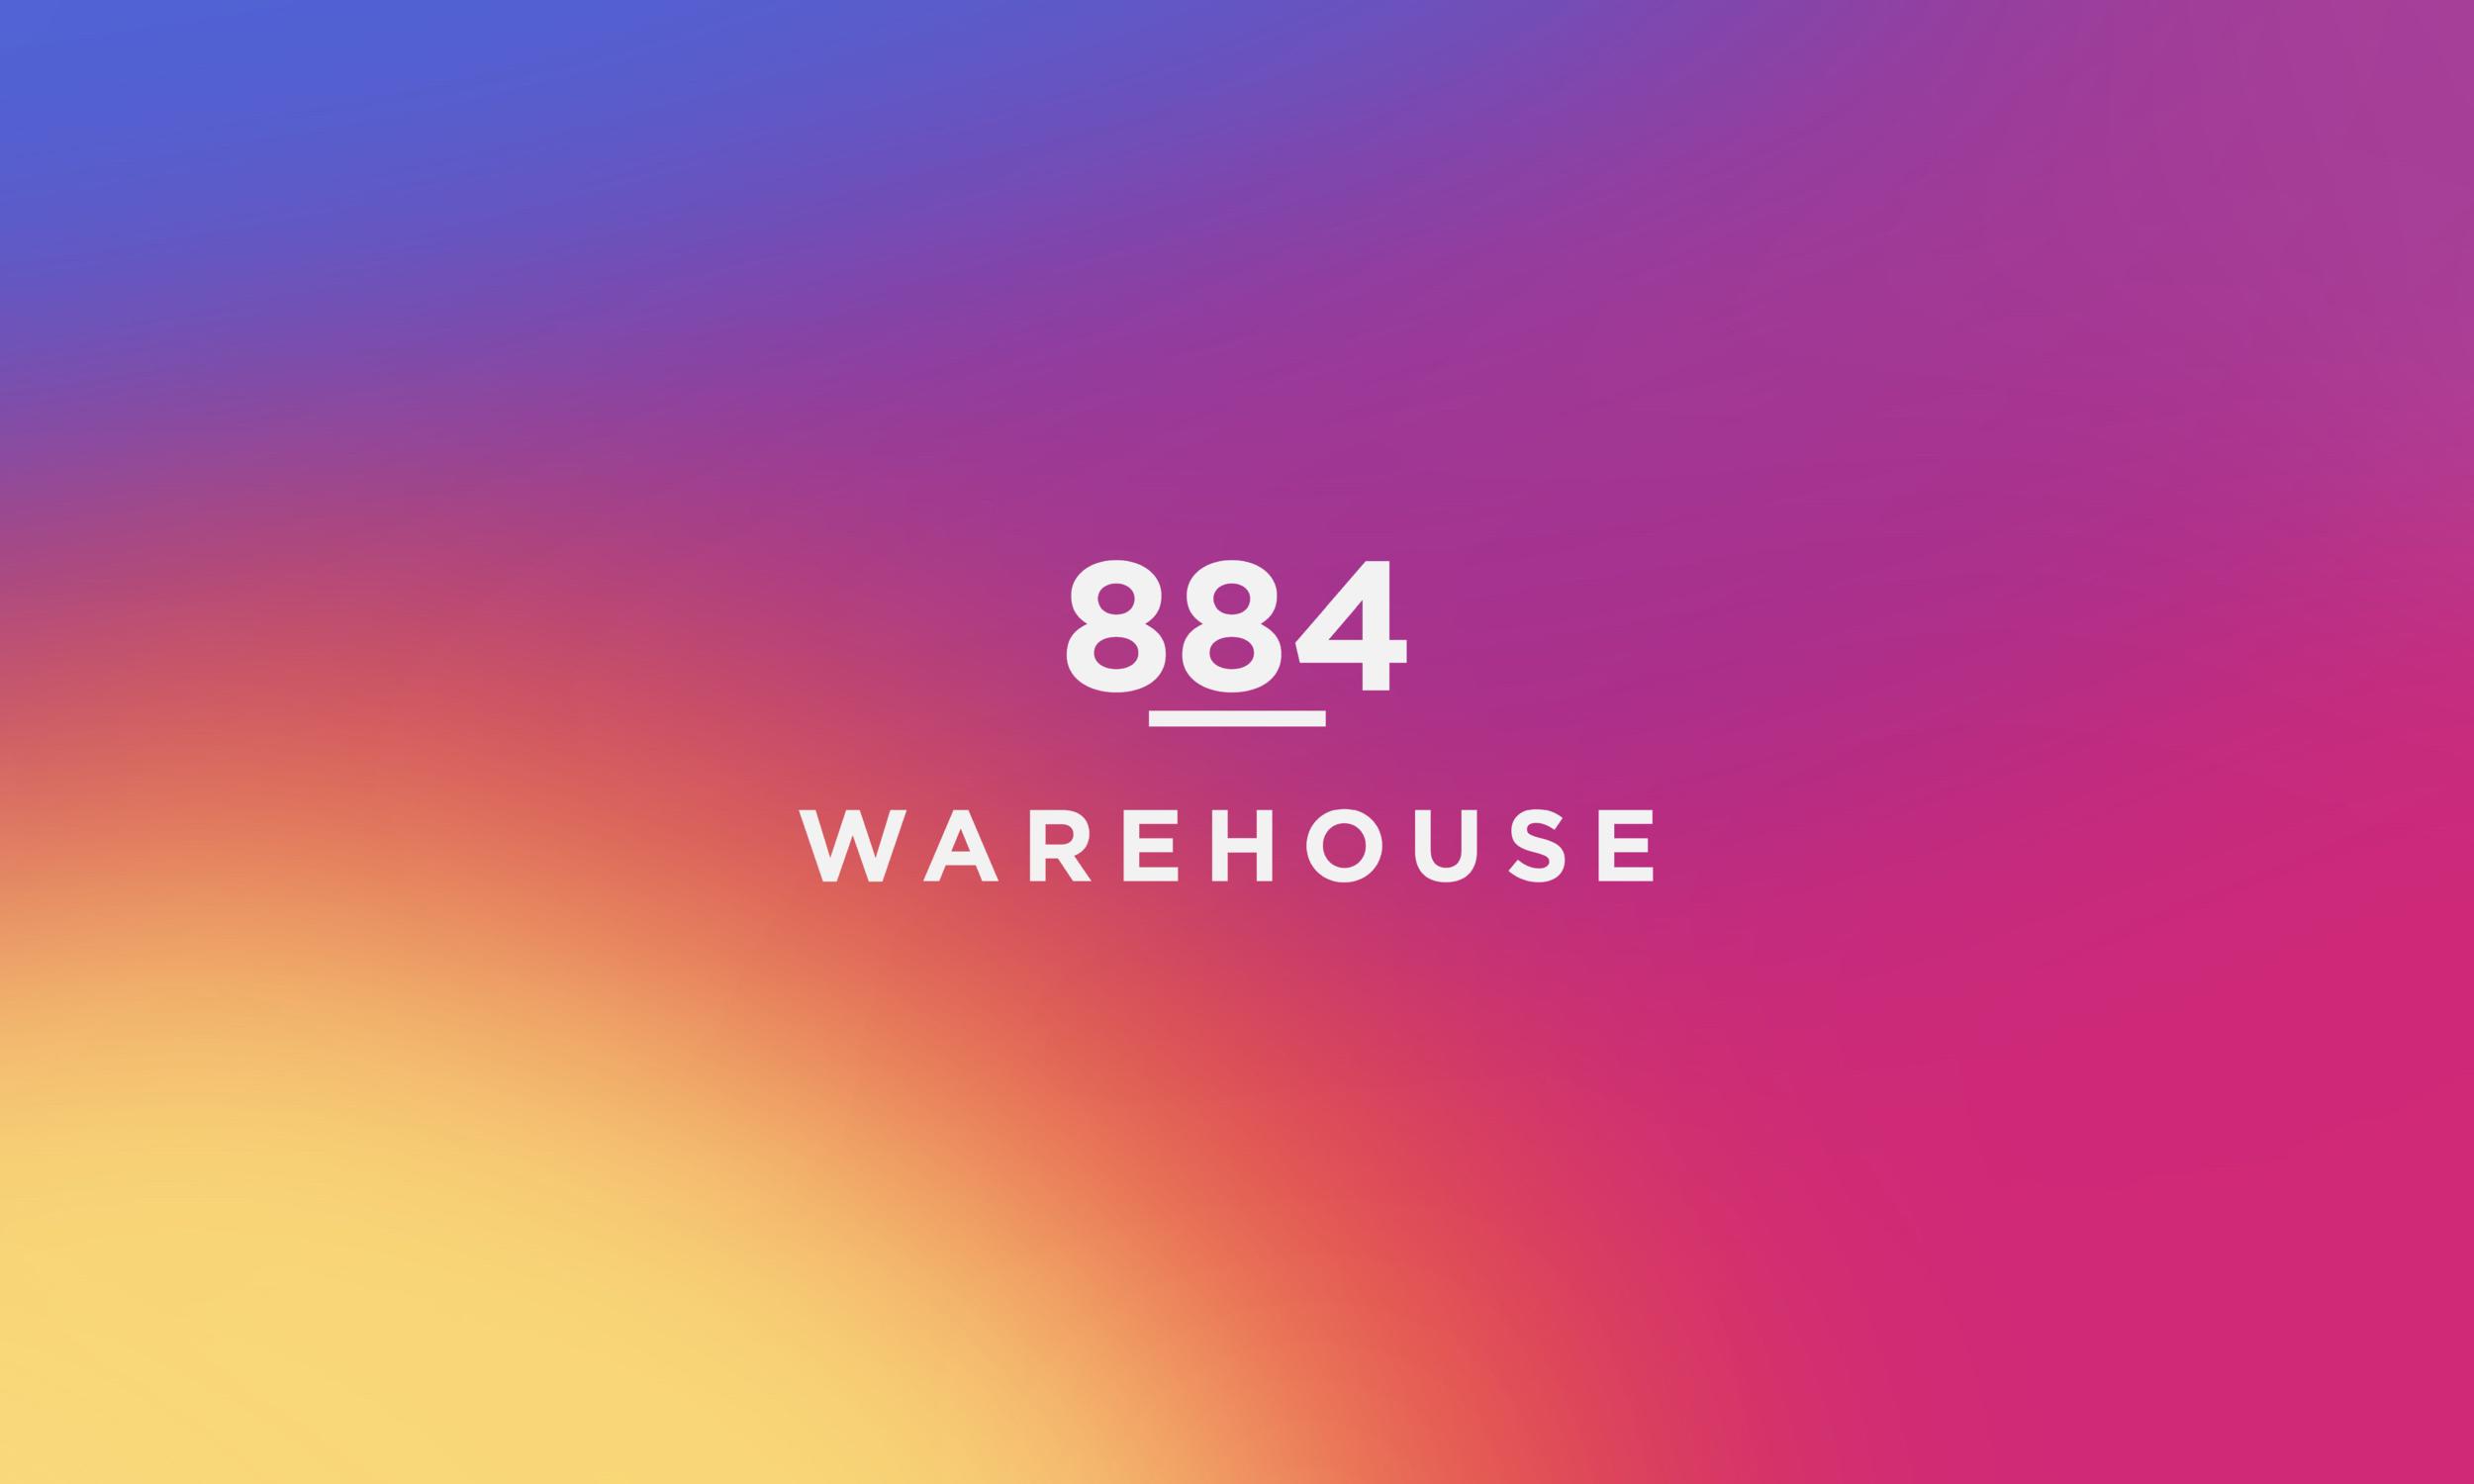 884 Warehouse Instagram.png